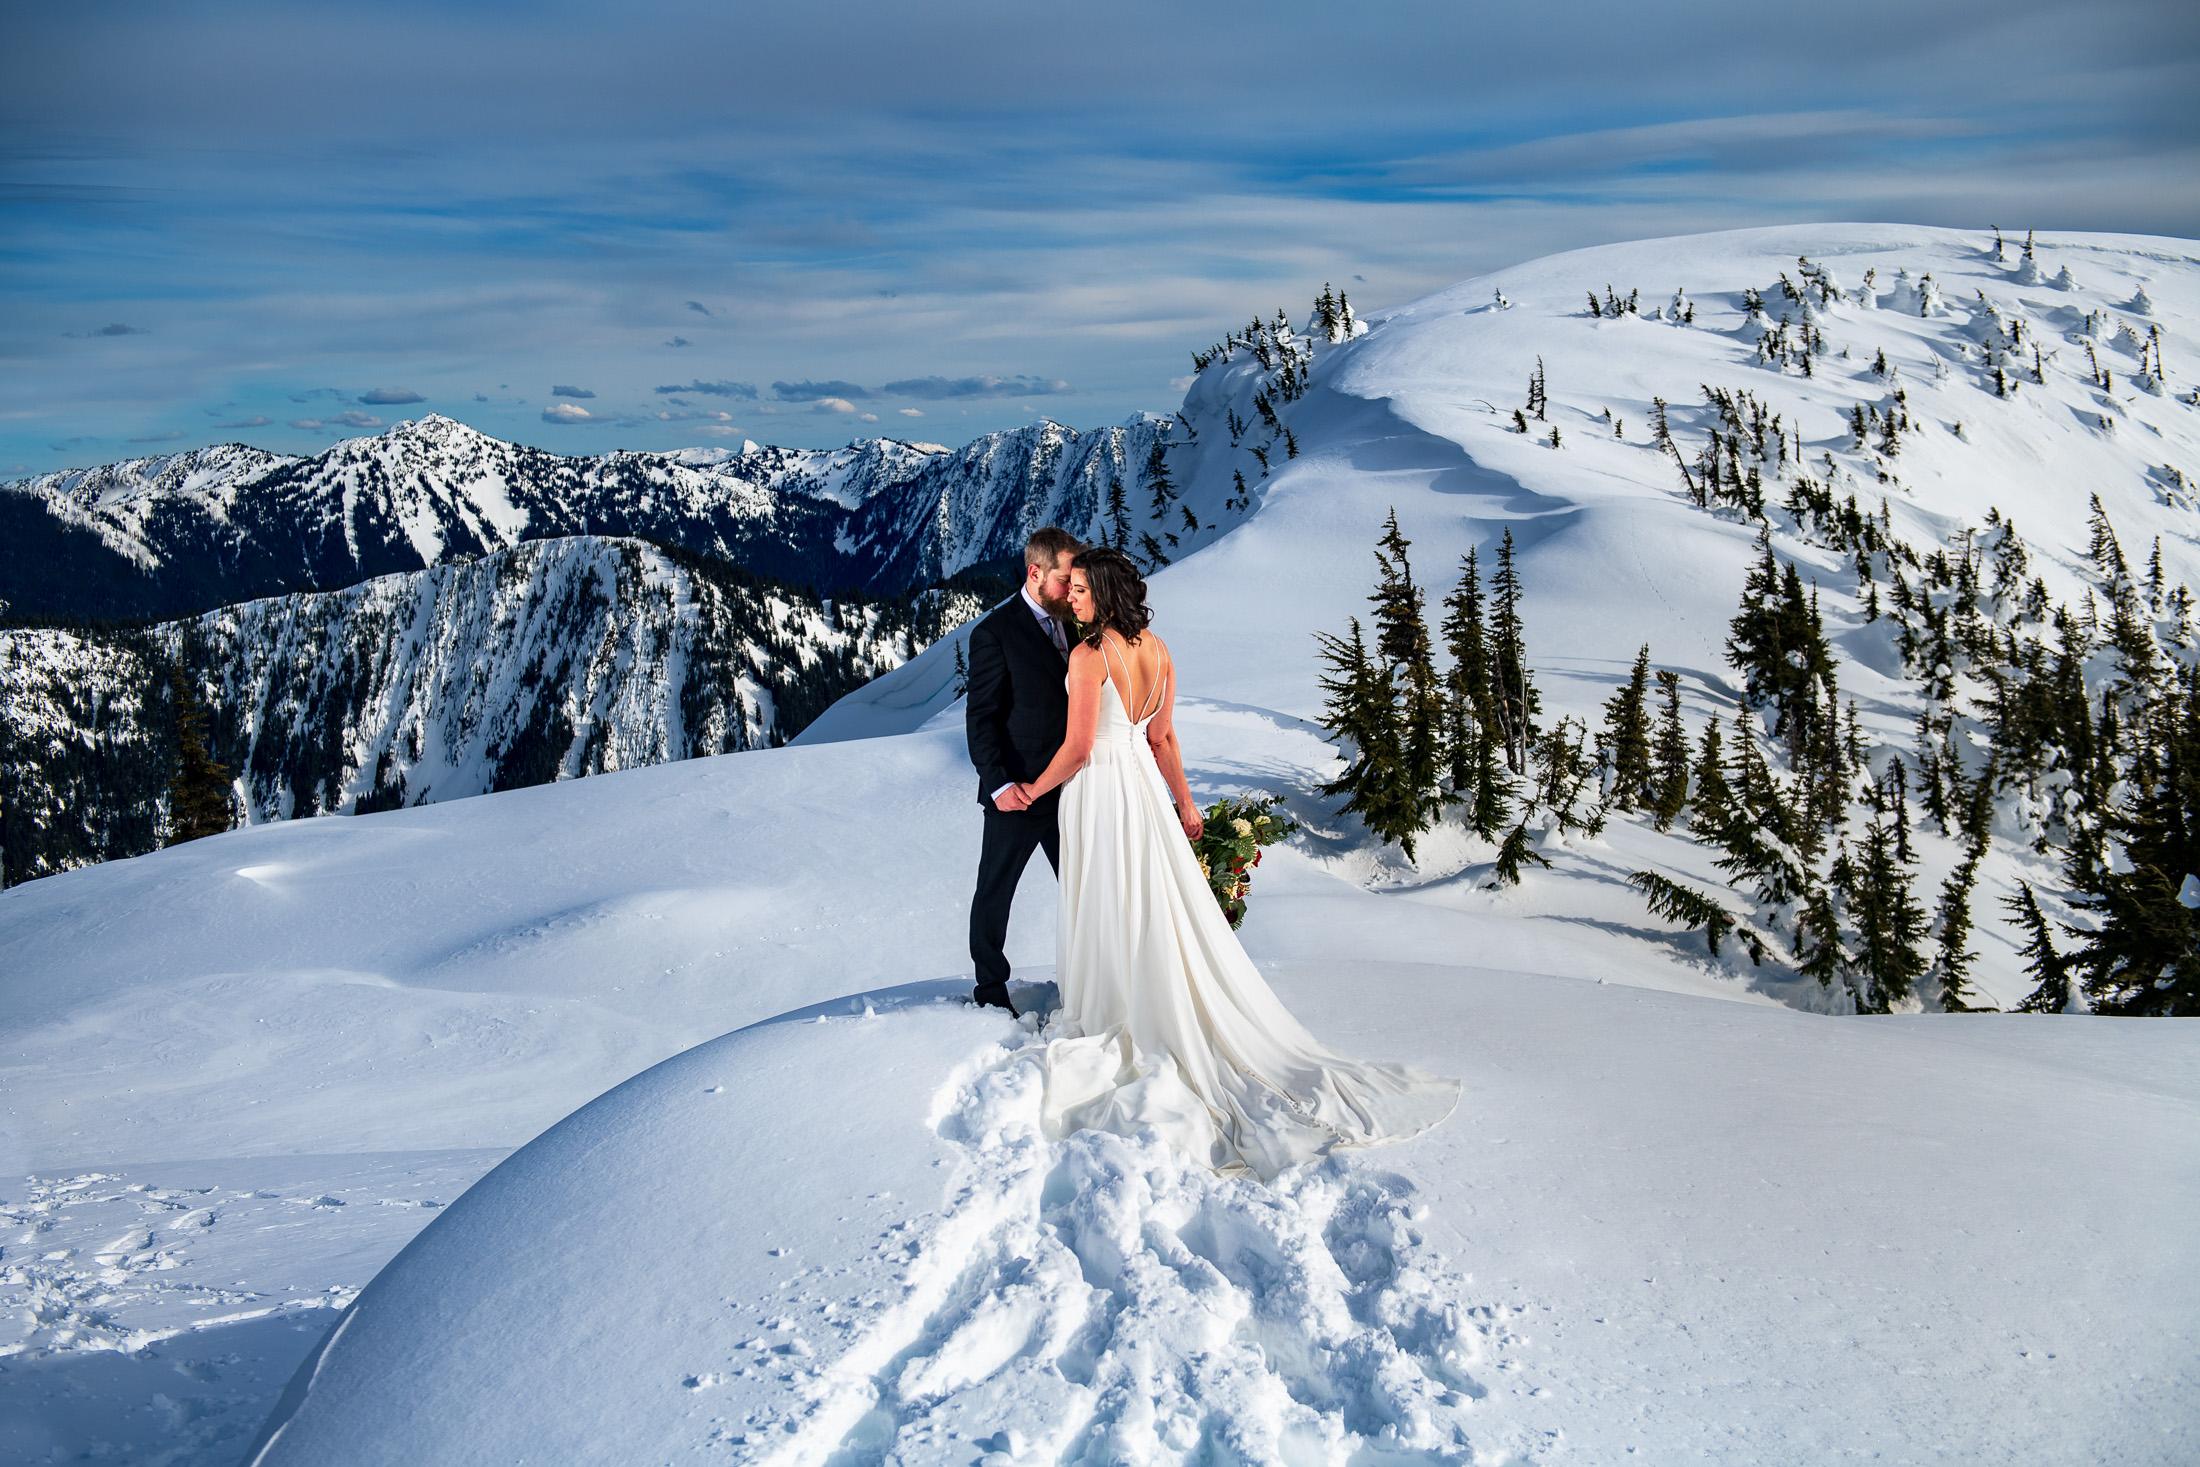 019 - adventure elopement british columbia